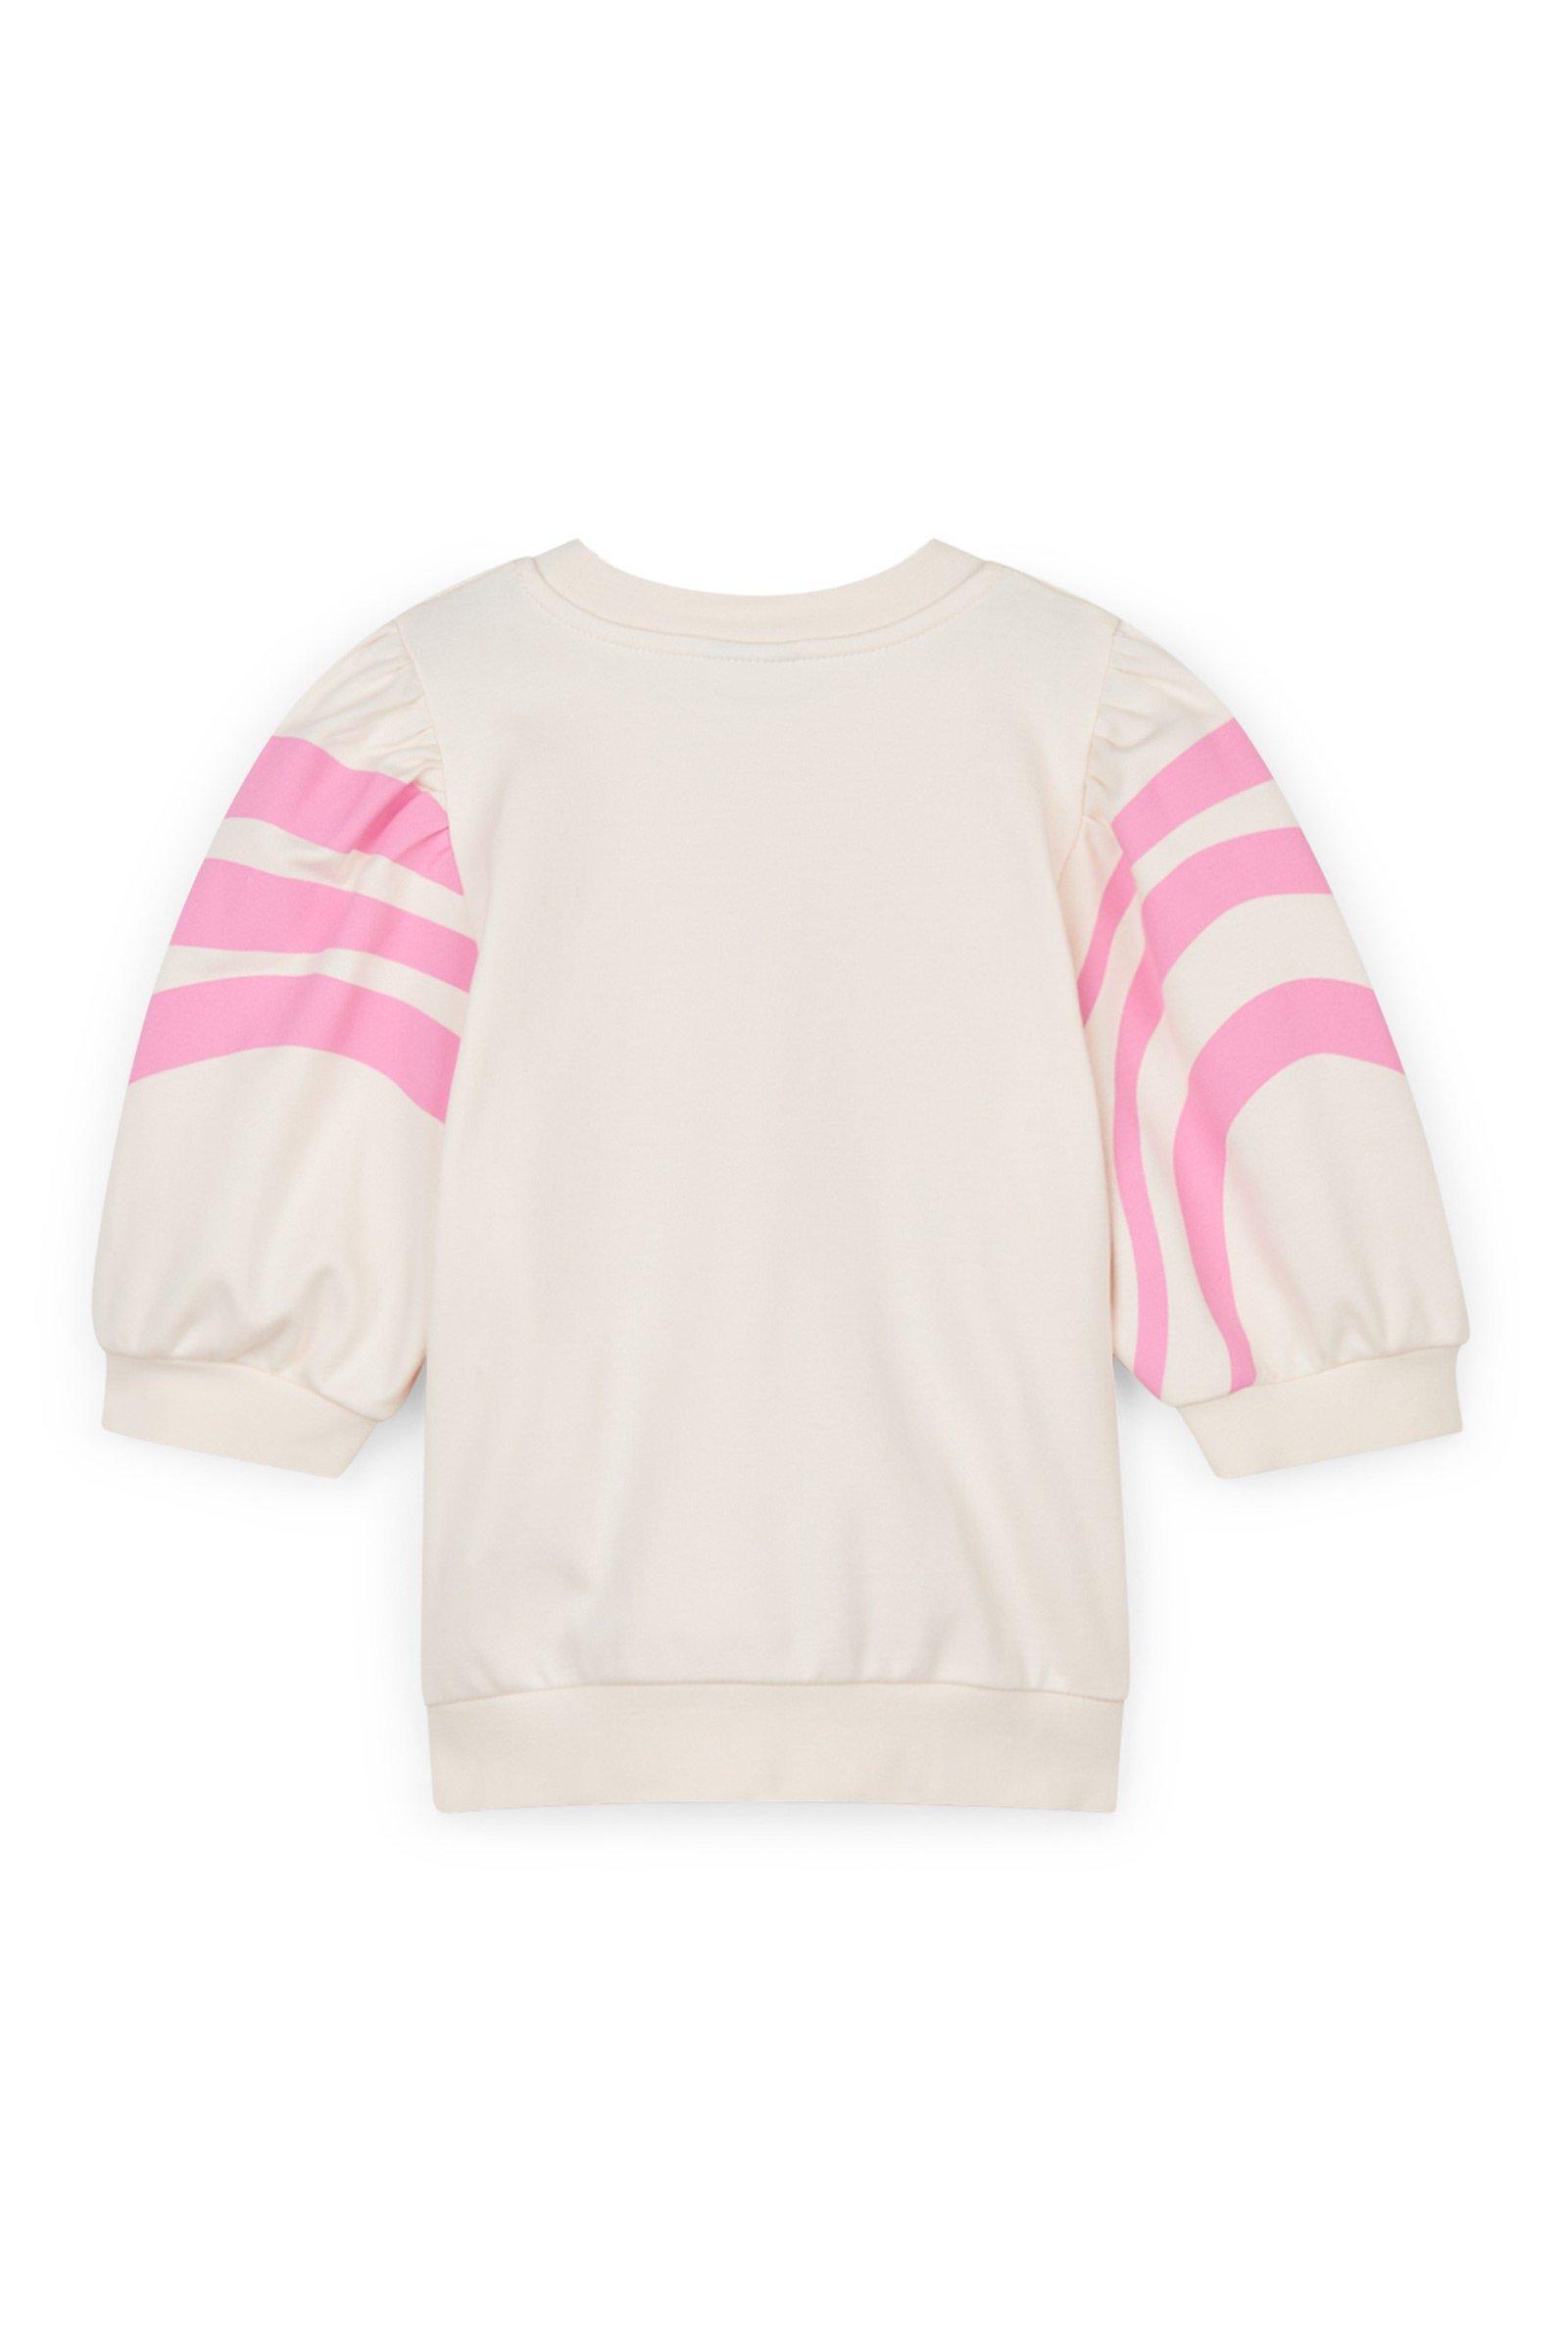 https://webmedia.cks-fashion.com/i/cks/123161WTM_100_h